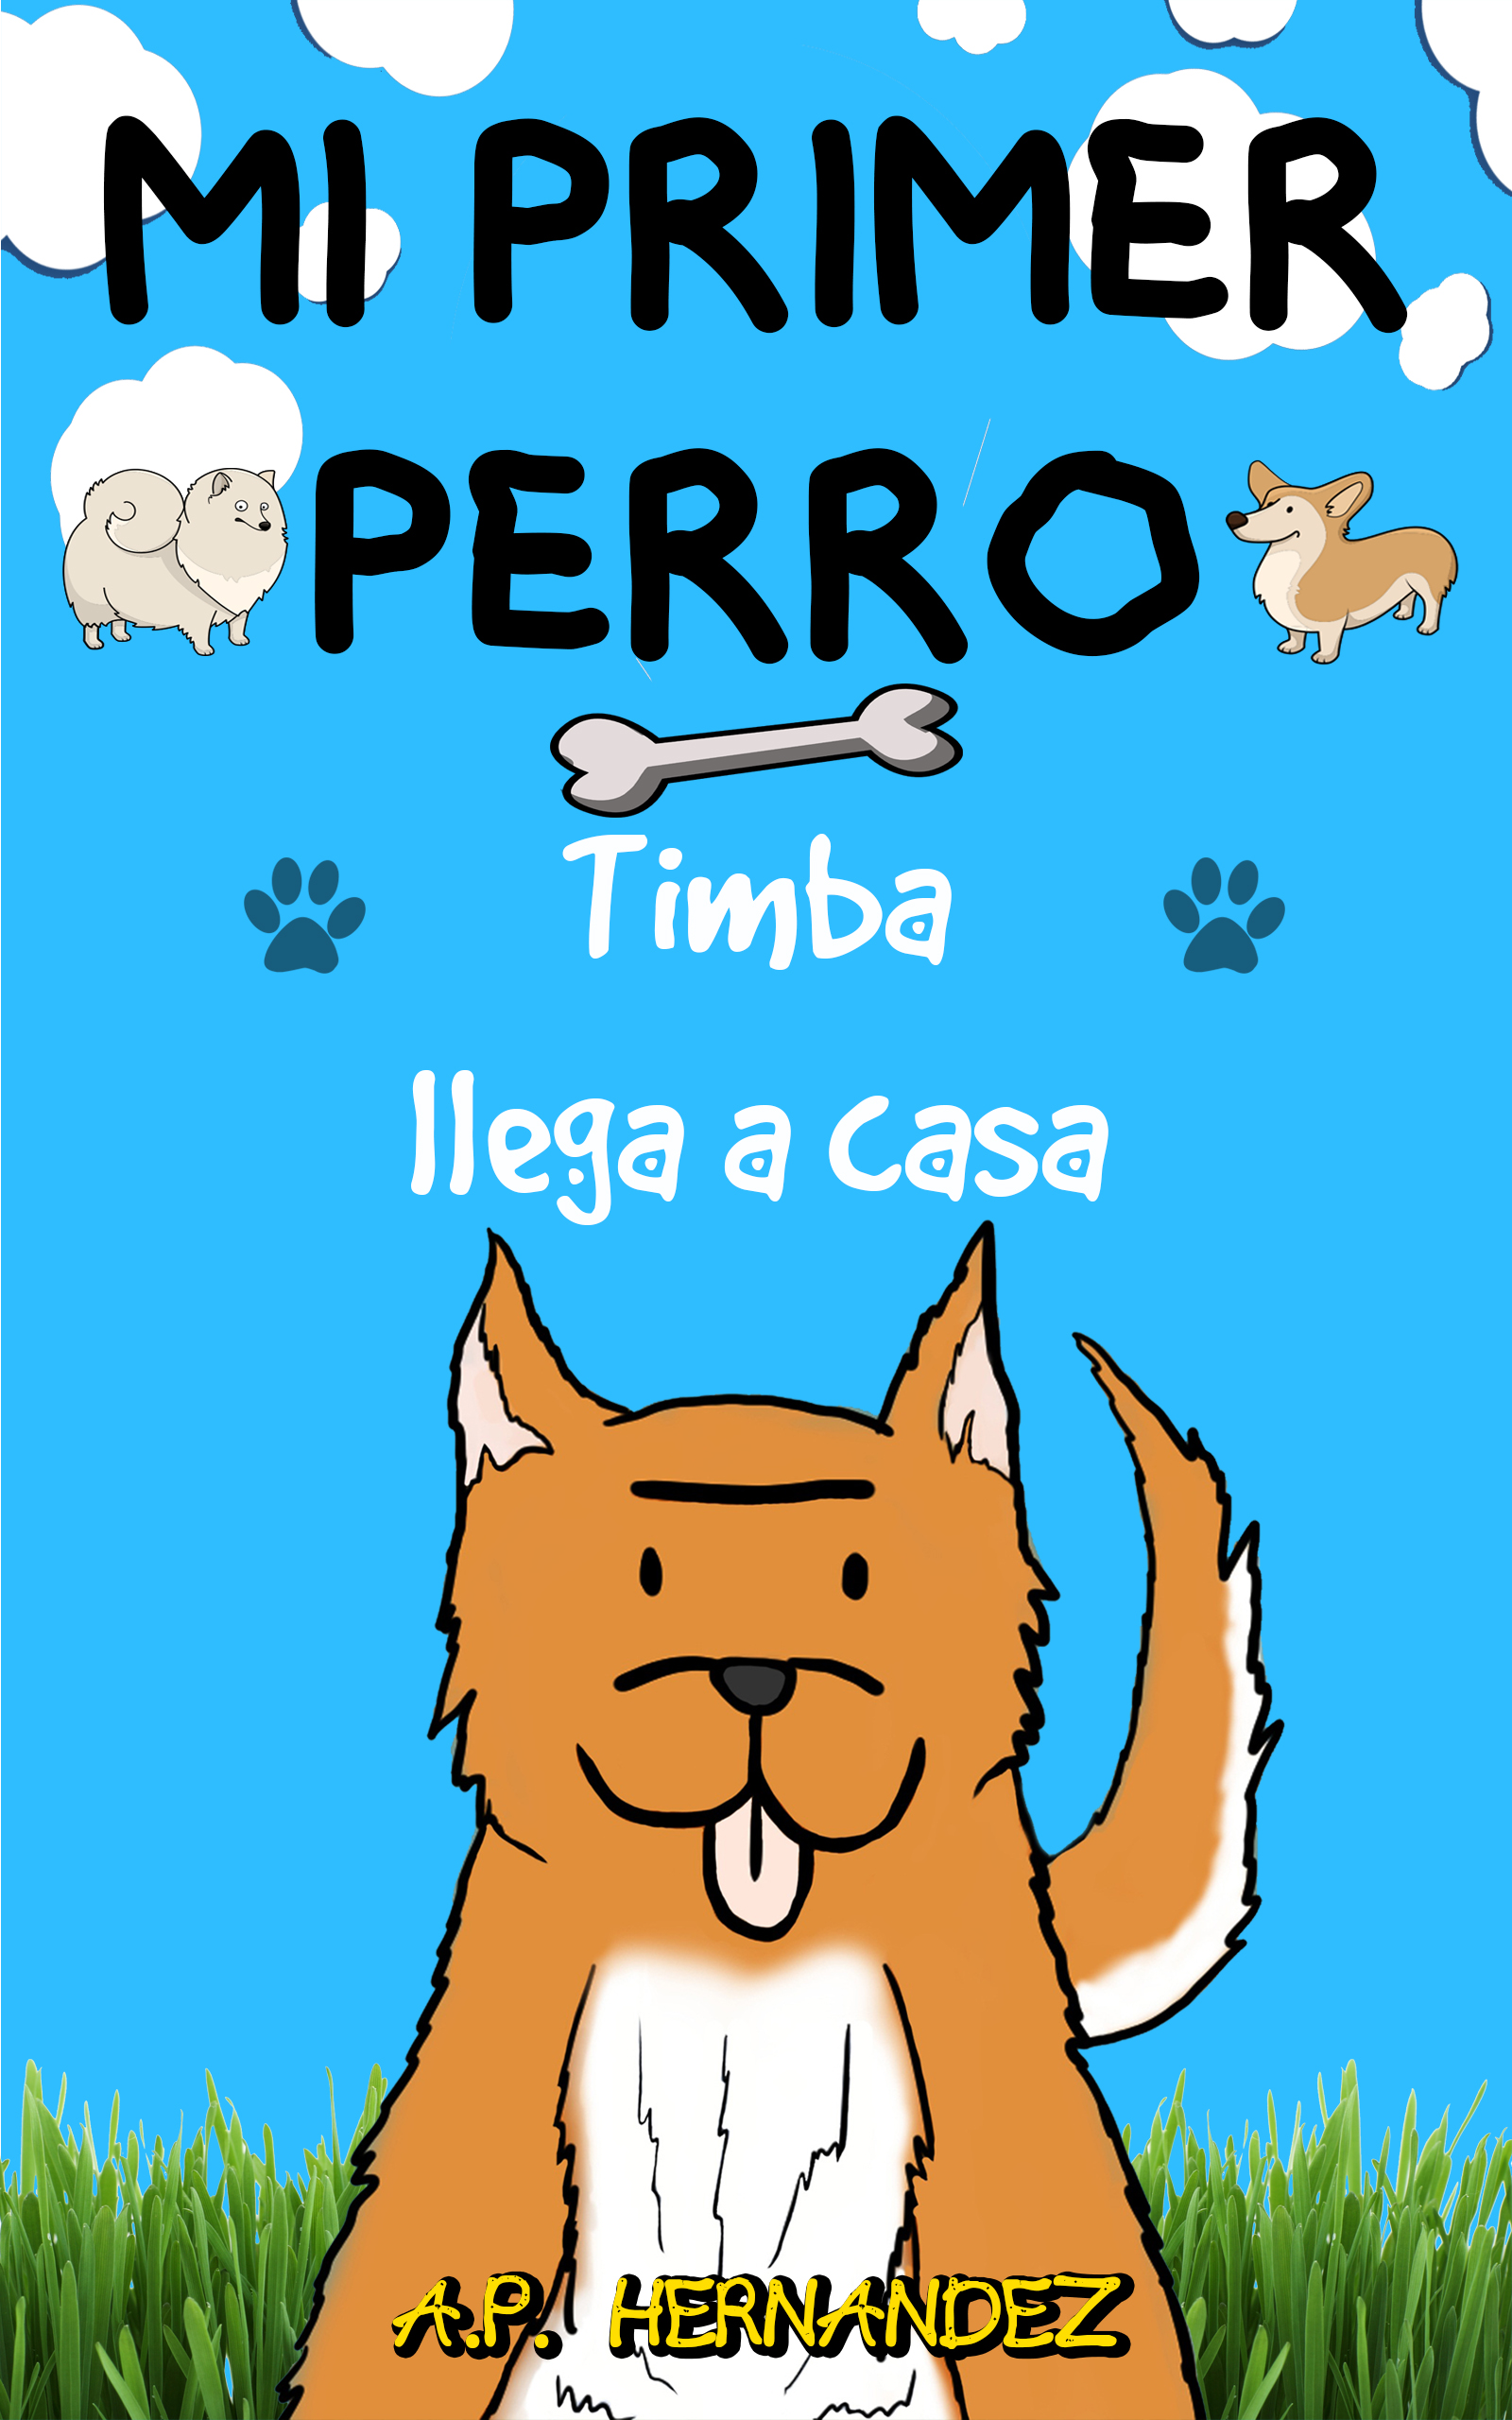 Mi primer perro: libro infantil (6 - 7 años). ¡timba llega a casa!